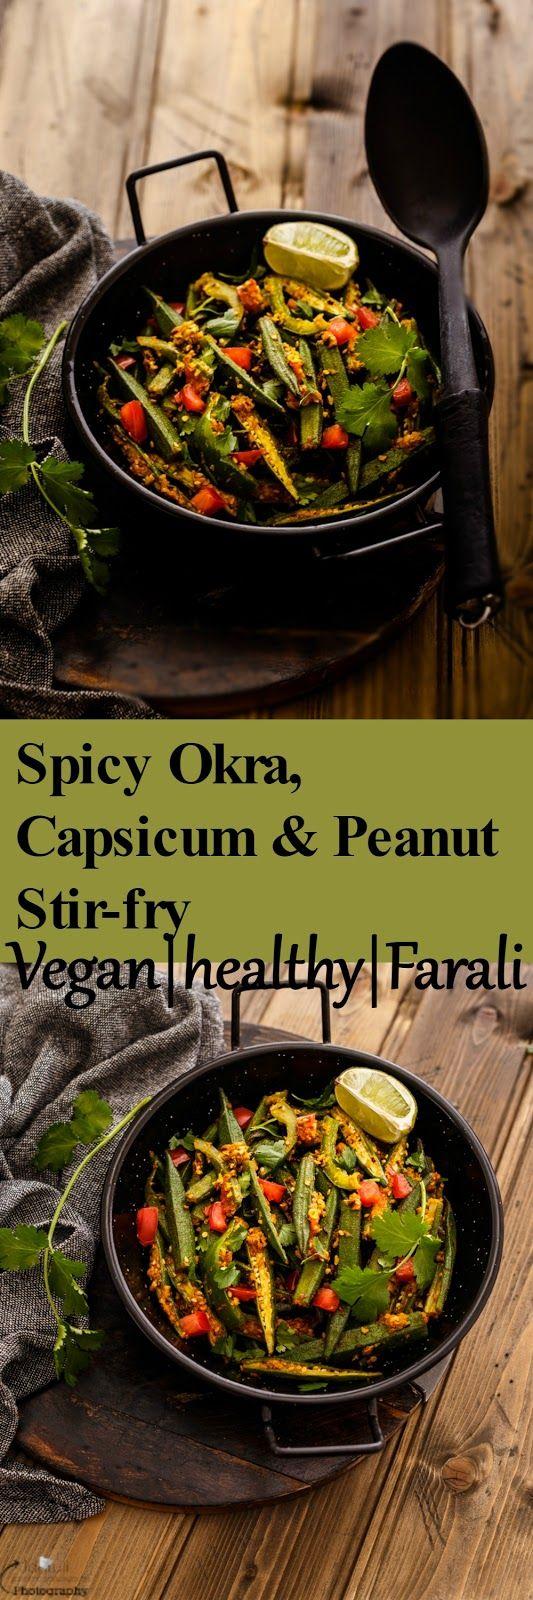 Jagruti's Cooking Odyssey: Farali Bhinda / Bhindi Capsicum - Spicy Okra, Capsicum and Peanut Stir-fry without Onion - Garlic